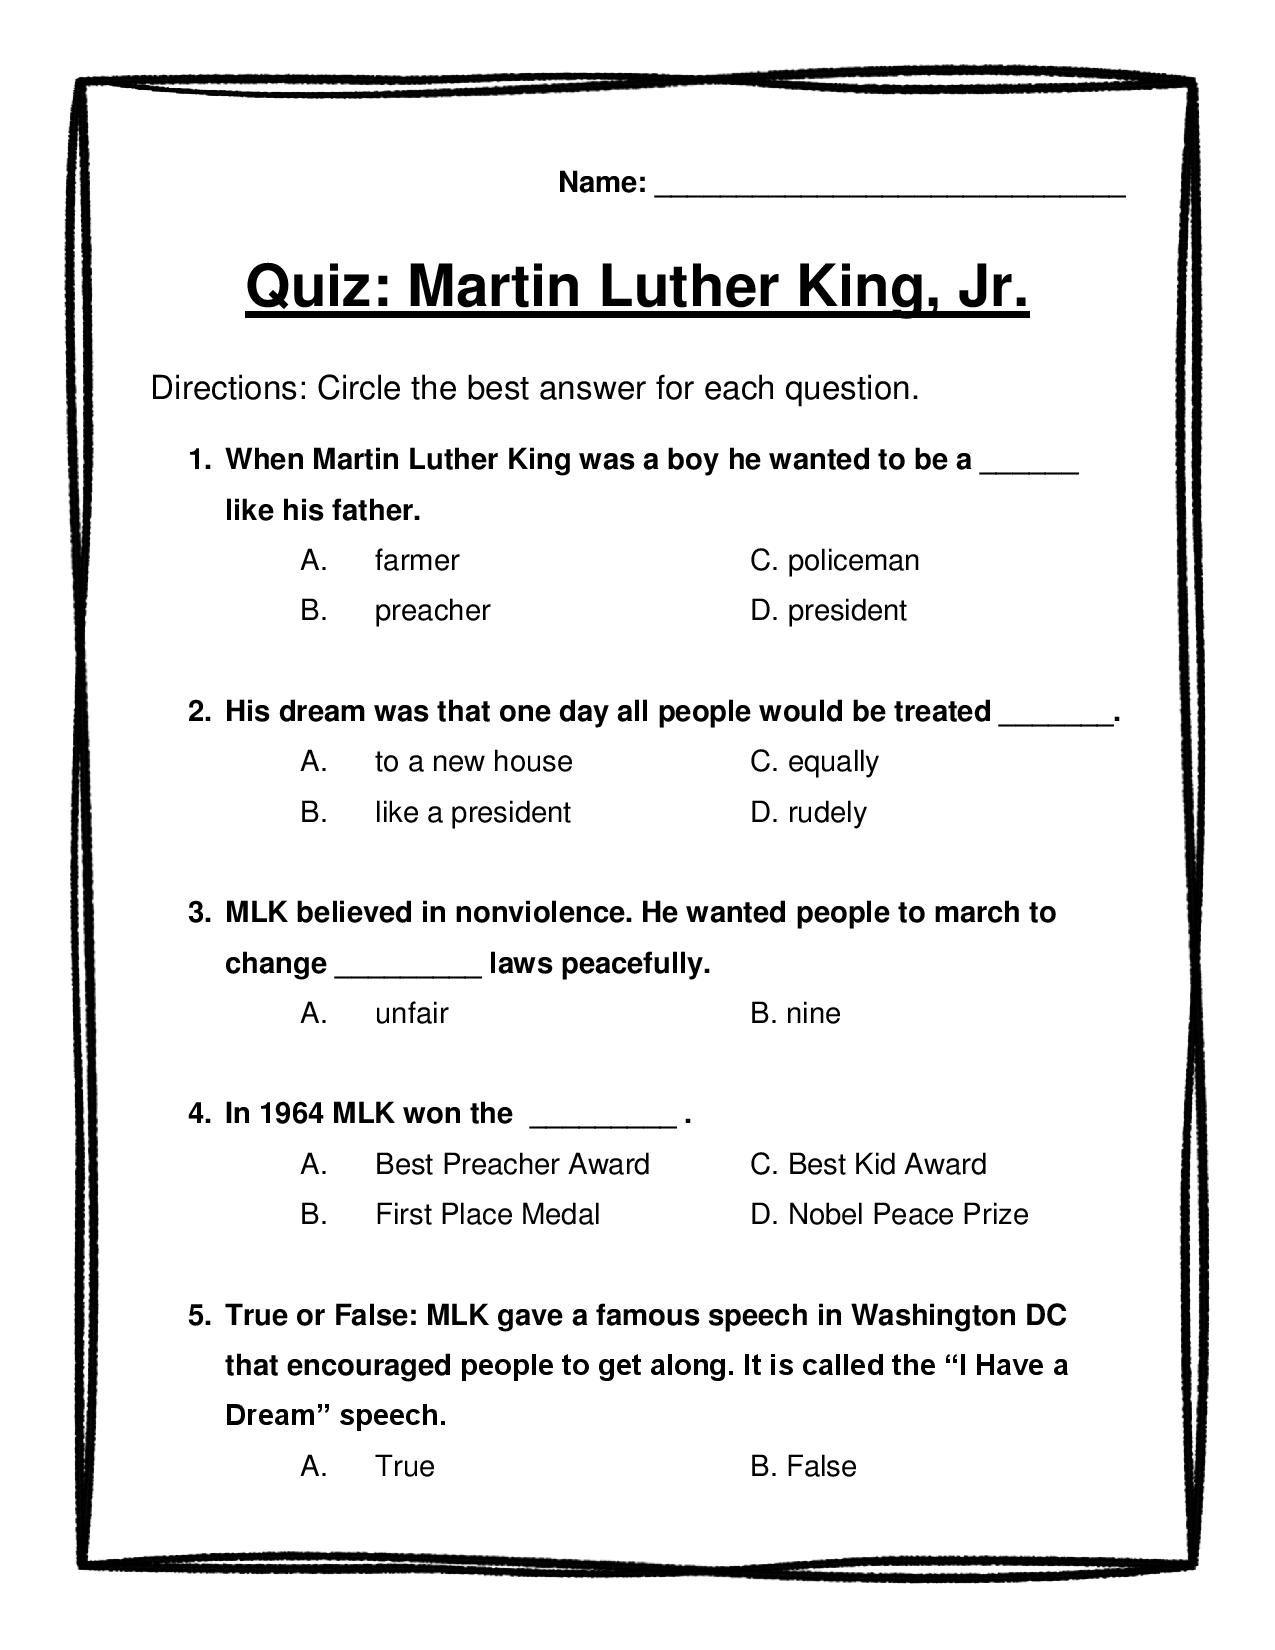 Free Black History Month Worksheet A Reading List In 2021 Black History Month Facts Black History Month Bulletin Board Black History Month Worksheets [ 1600 x 1237 Pixel ]